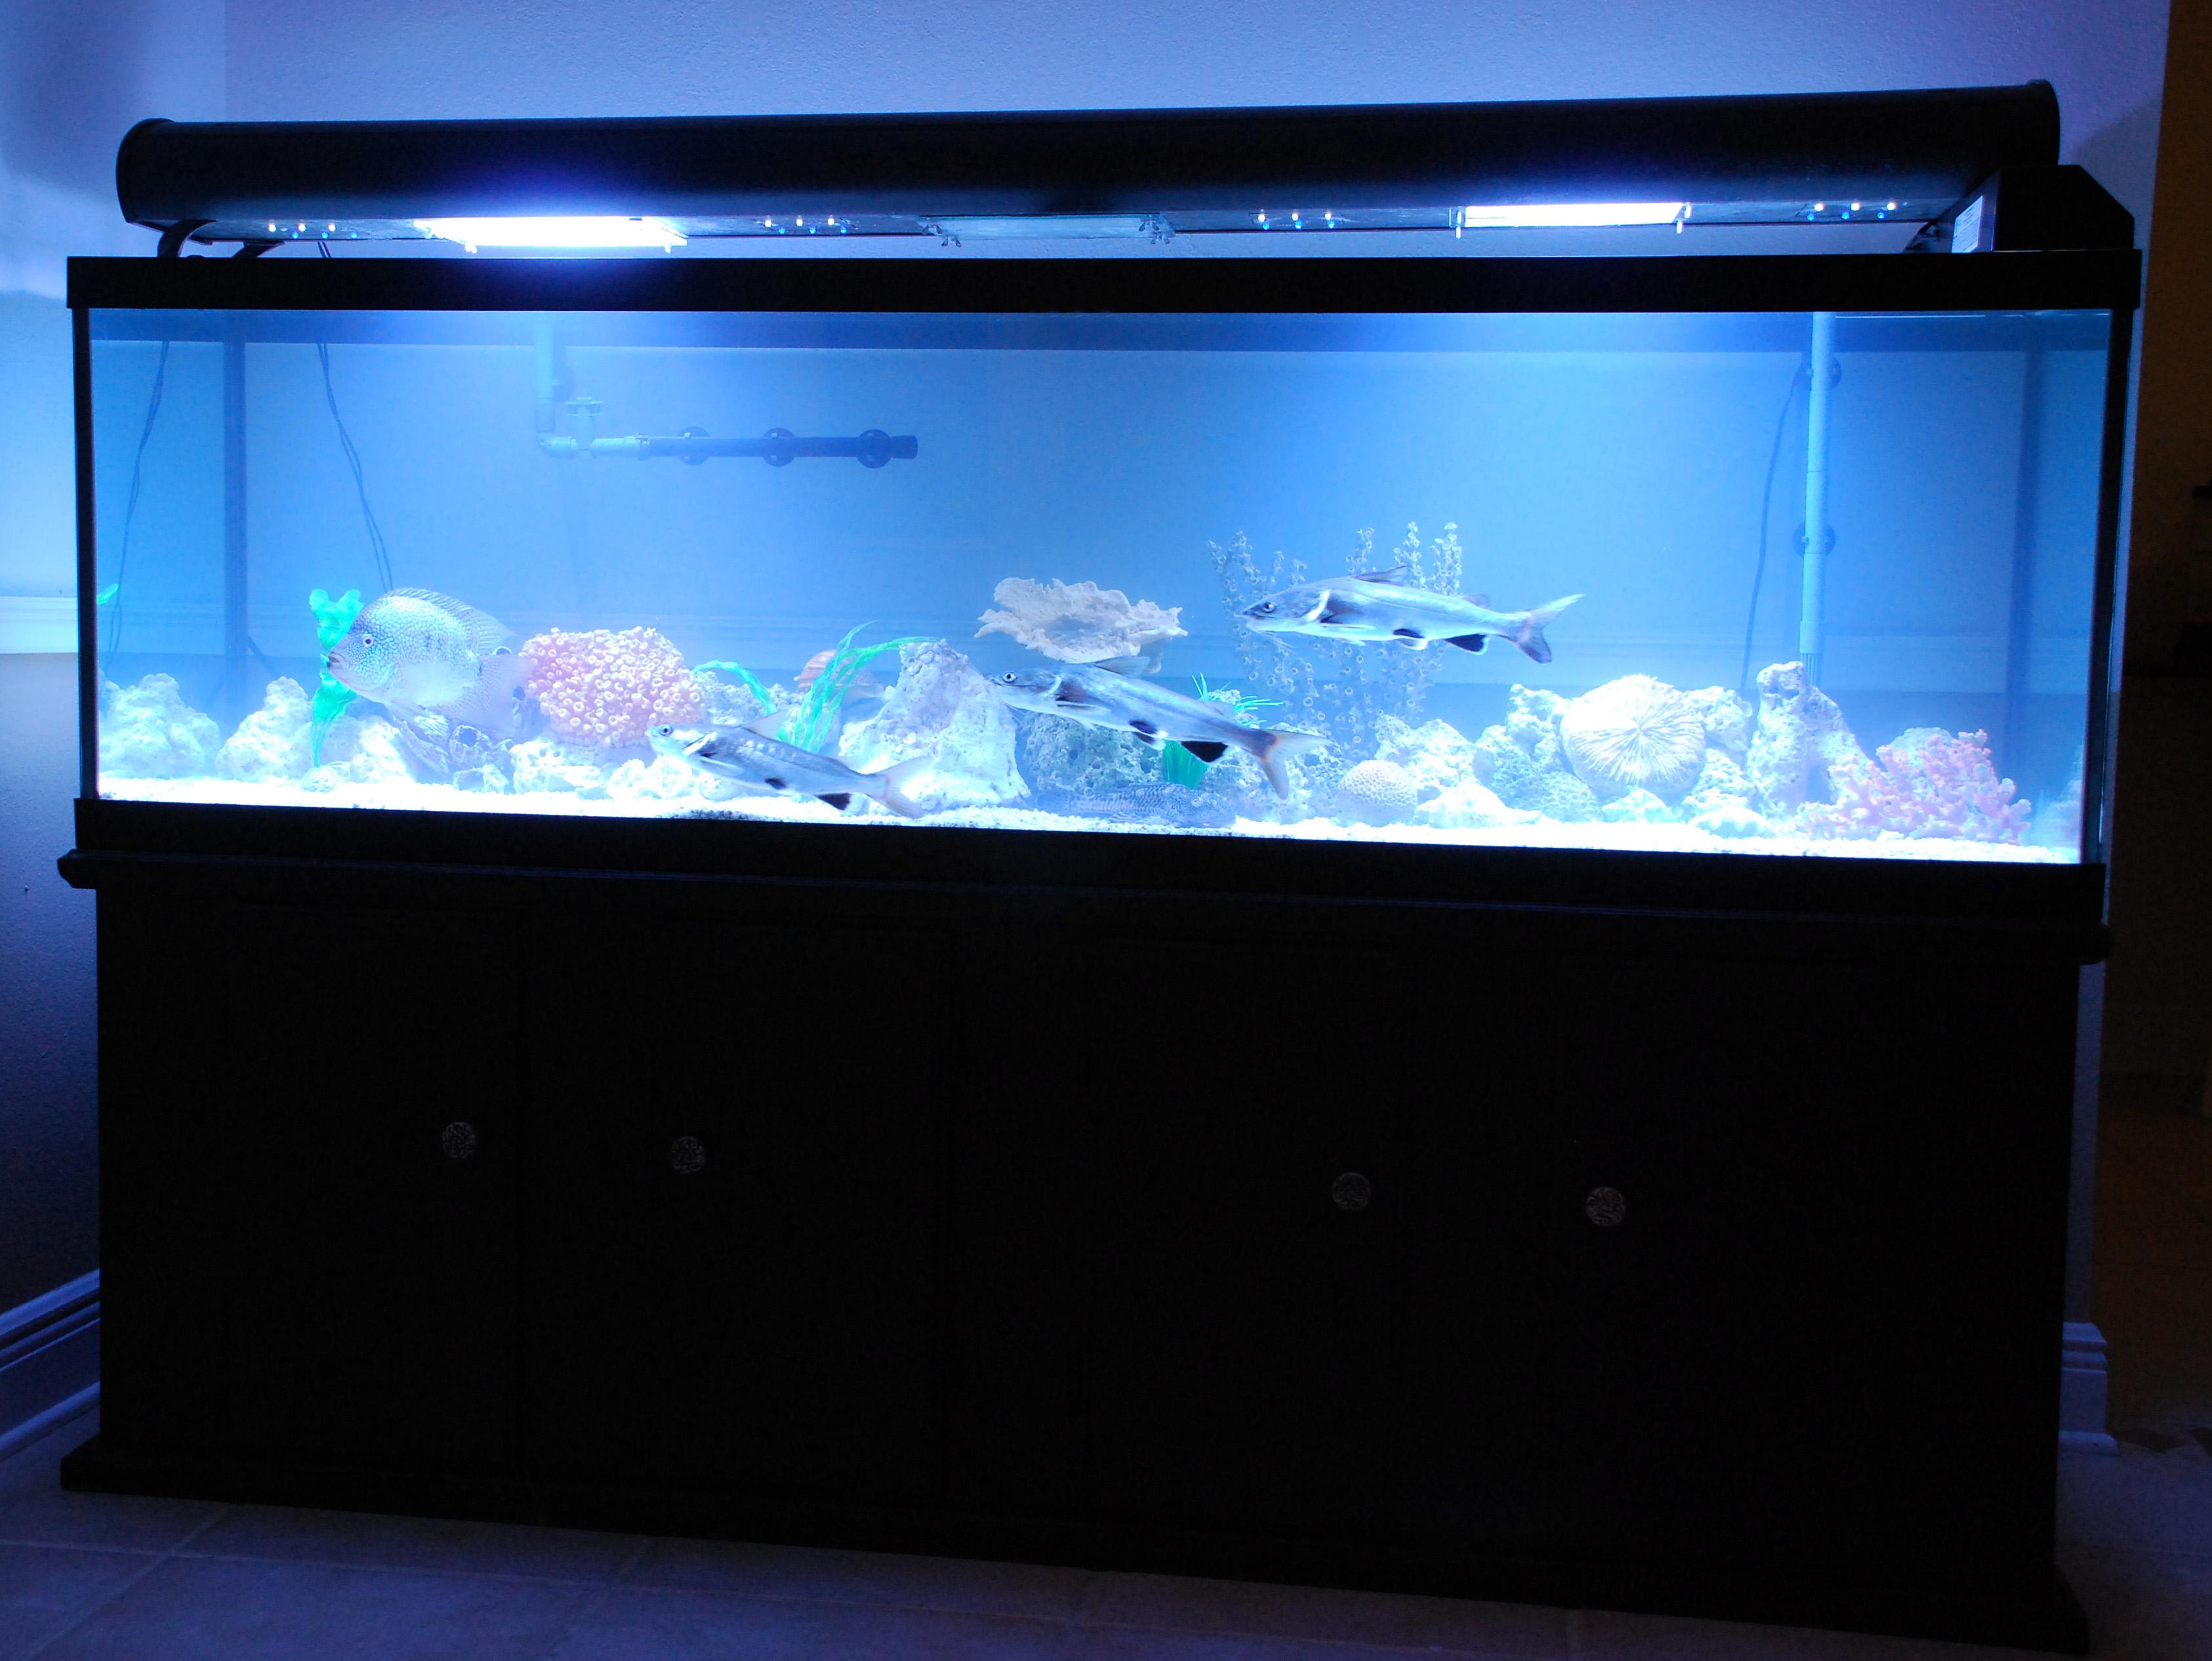 125 gallon fish tank flickr photo sharing for 5 gallon fish tank dimensions